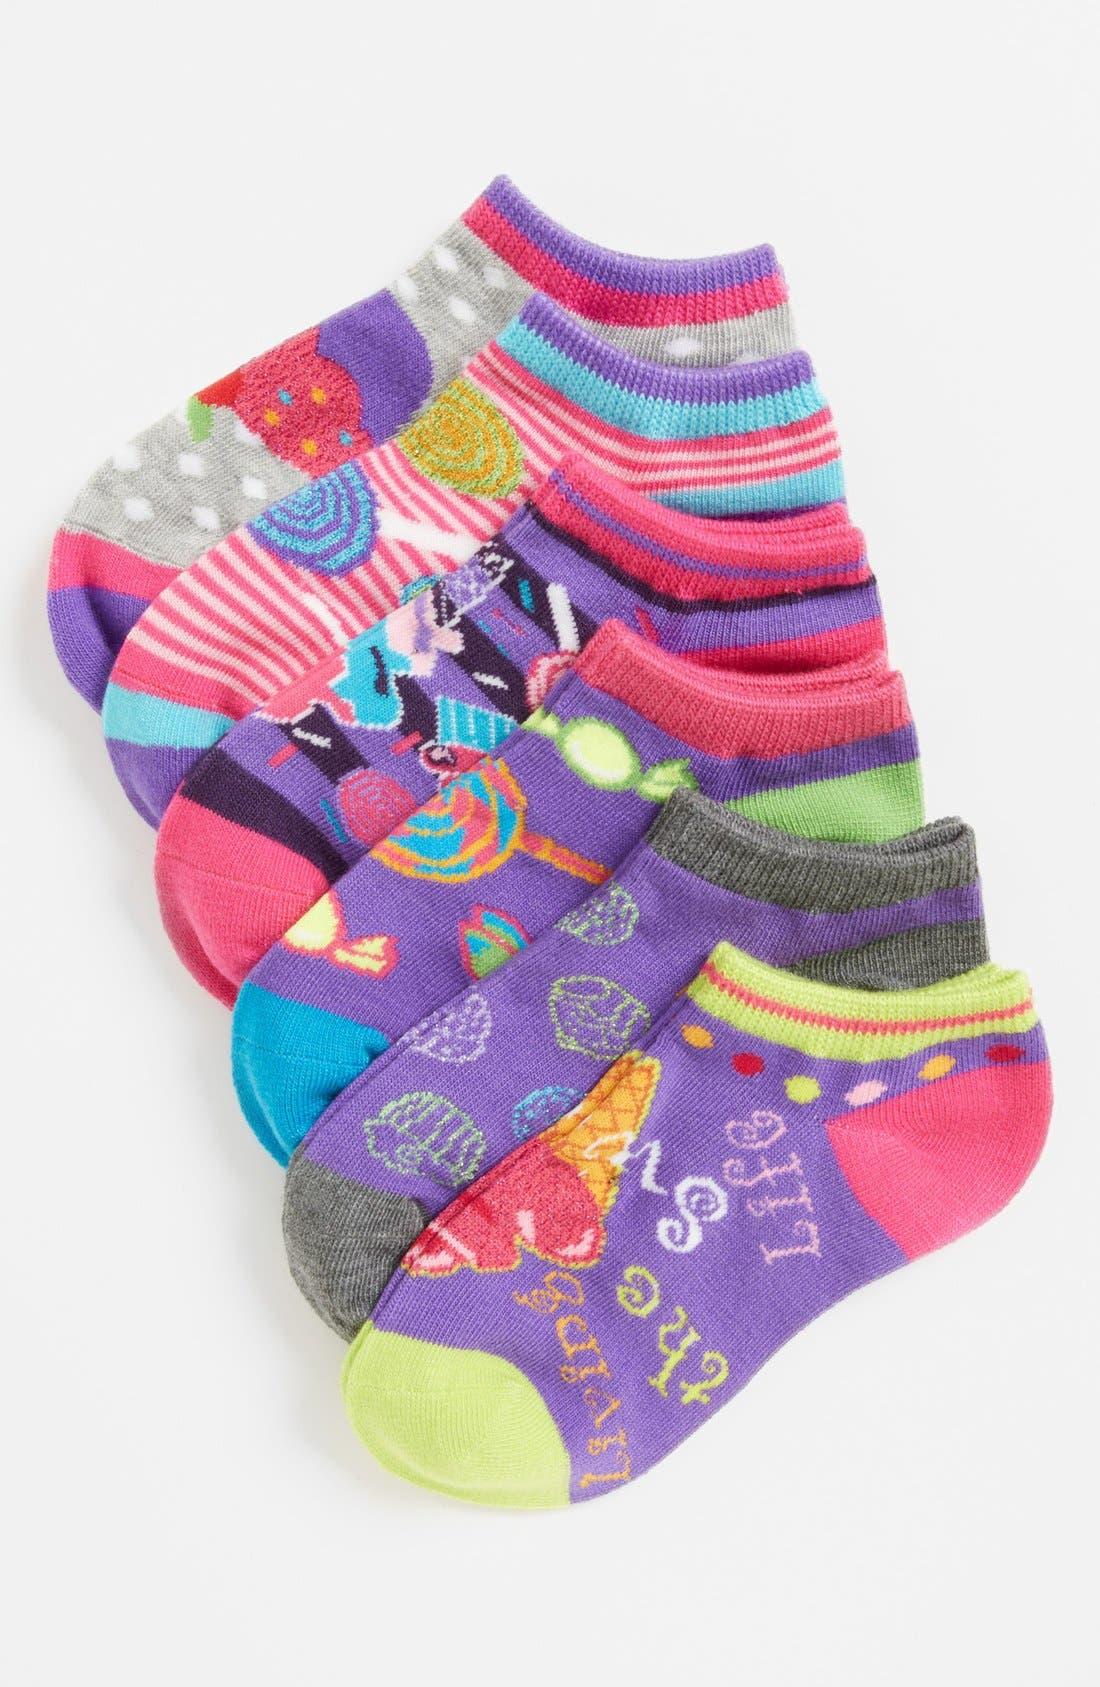 Main Image - Nordstrom 'Food Friends' Low Cut Socks (6-Pack) (Toddler Girls, Little Girls & Big Girls)